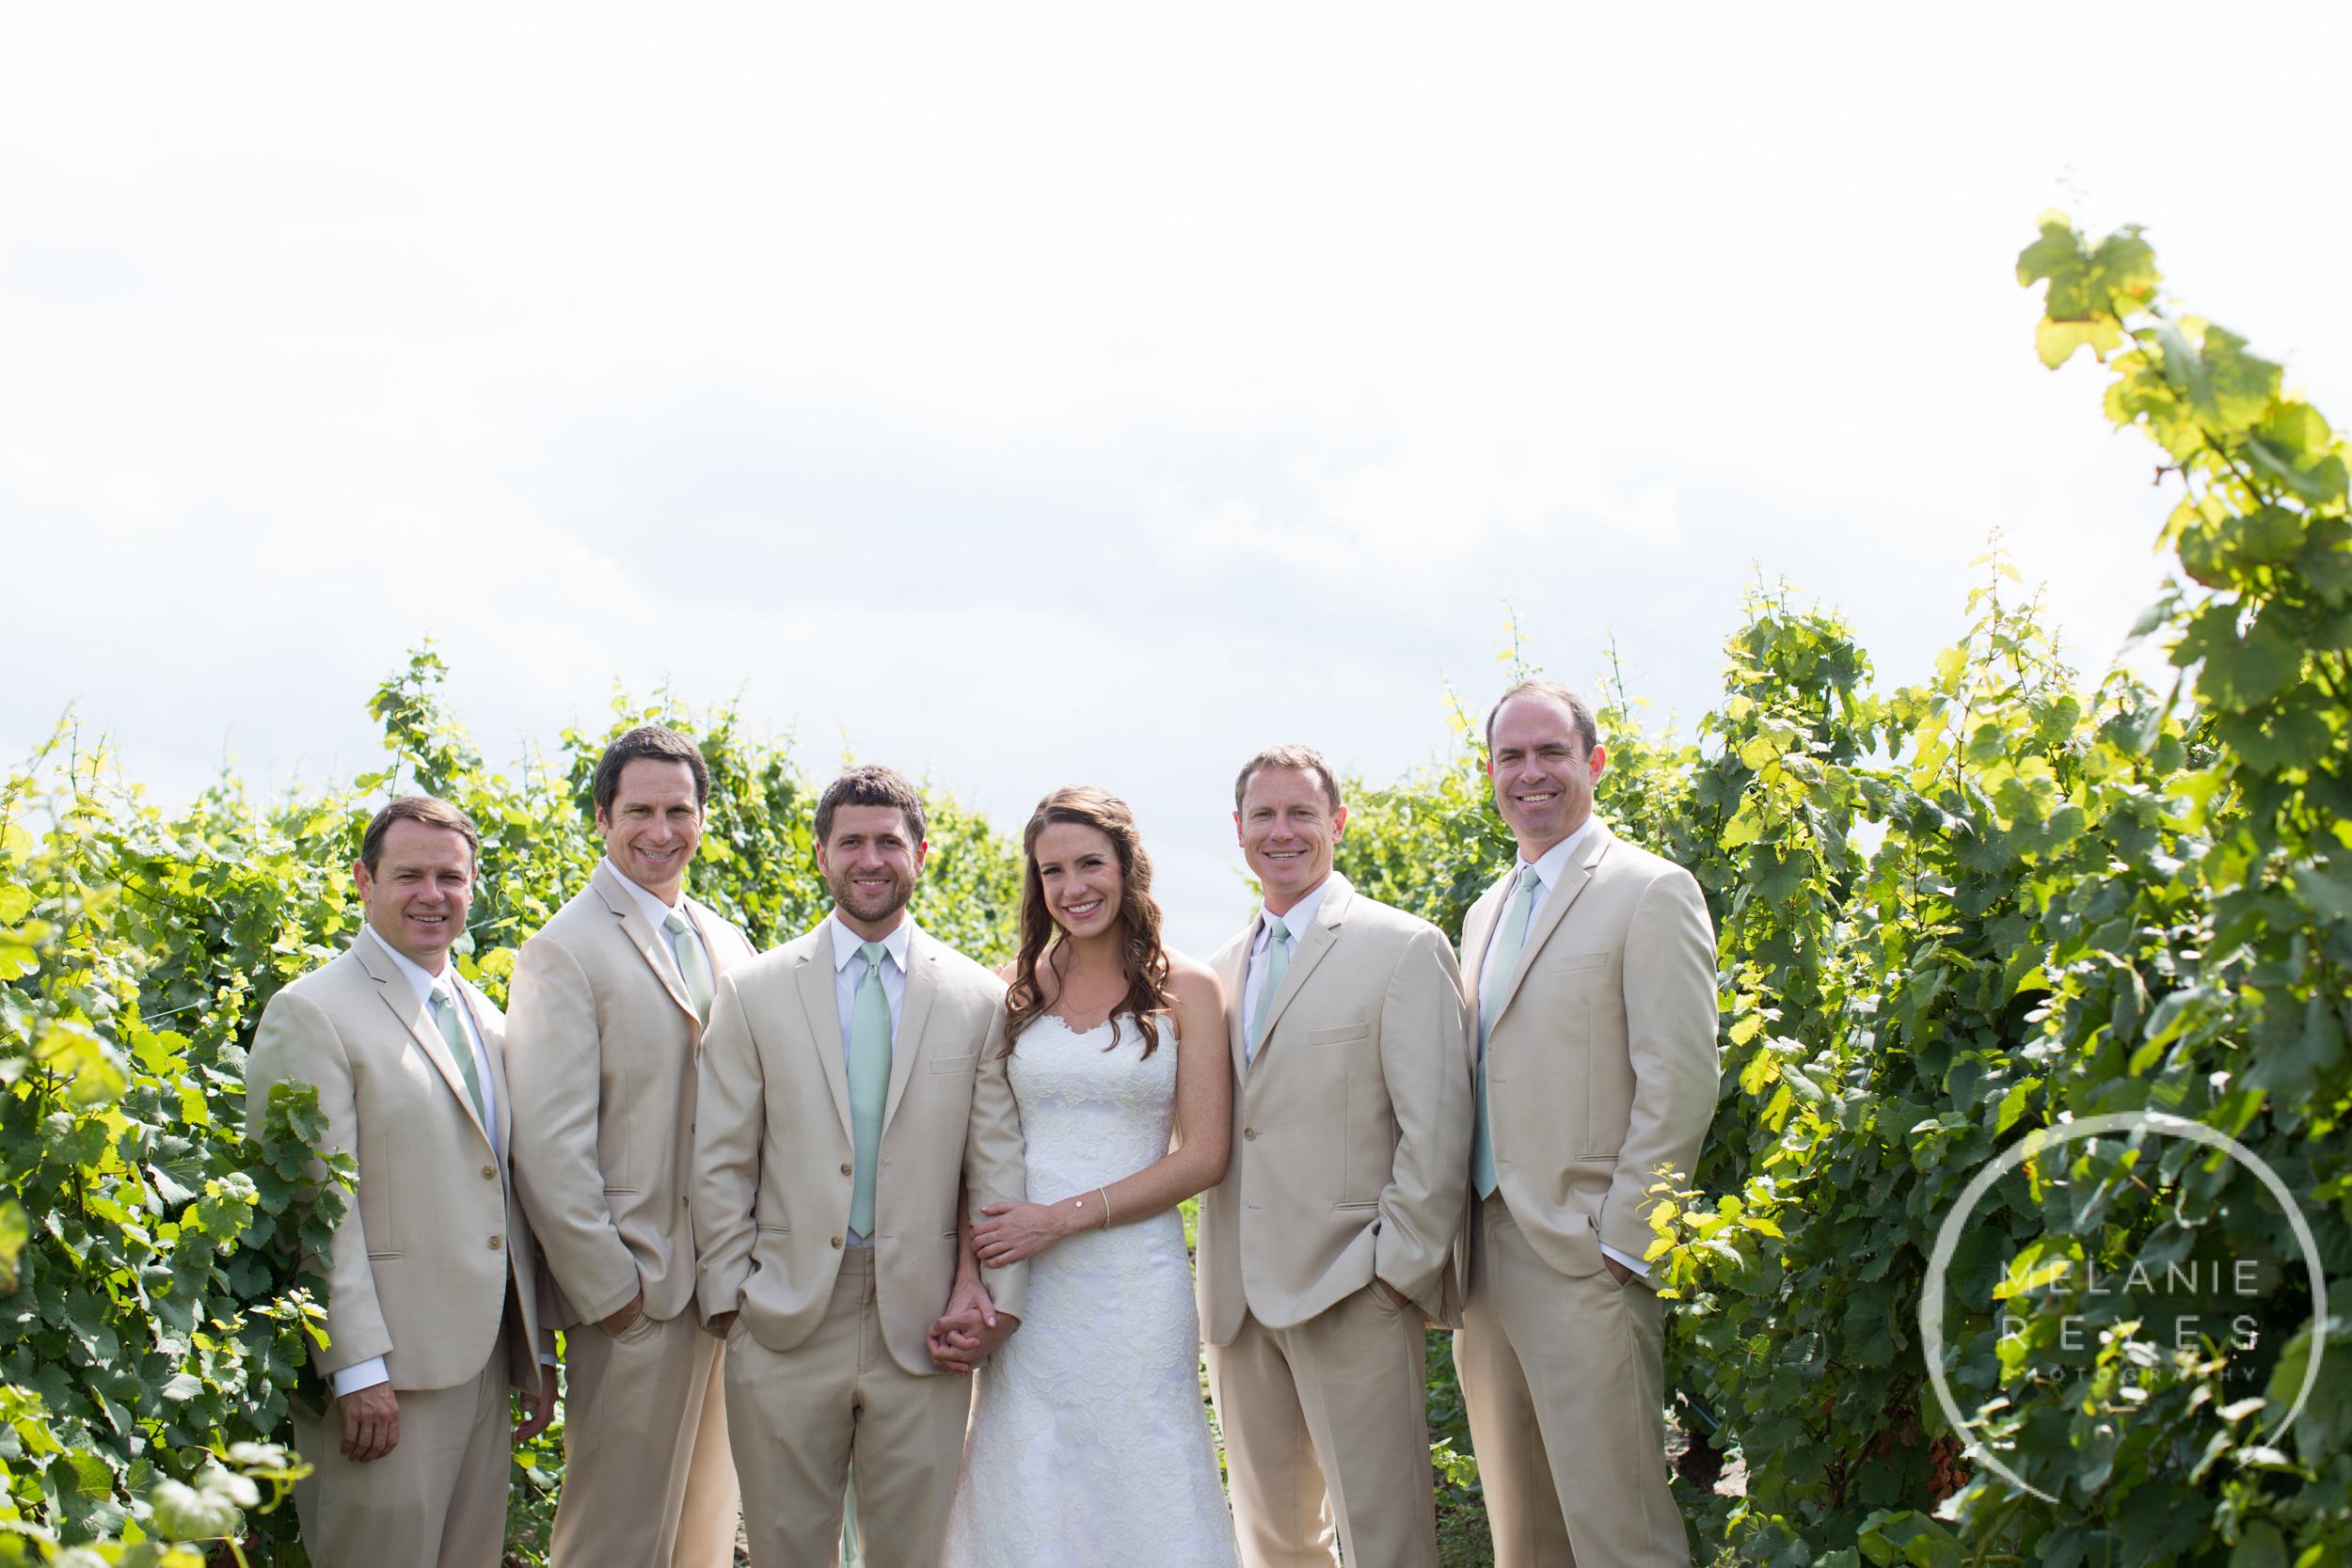 vineyard_wedding_009.jpg